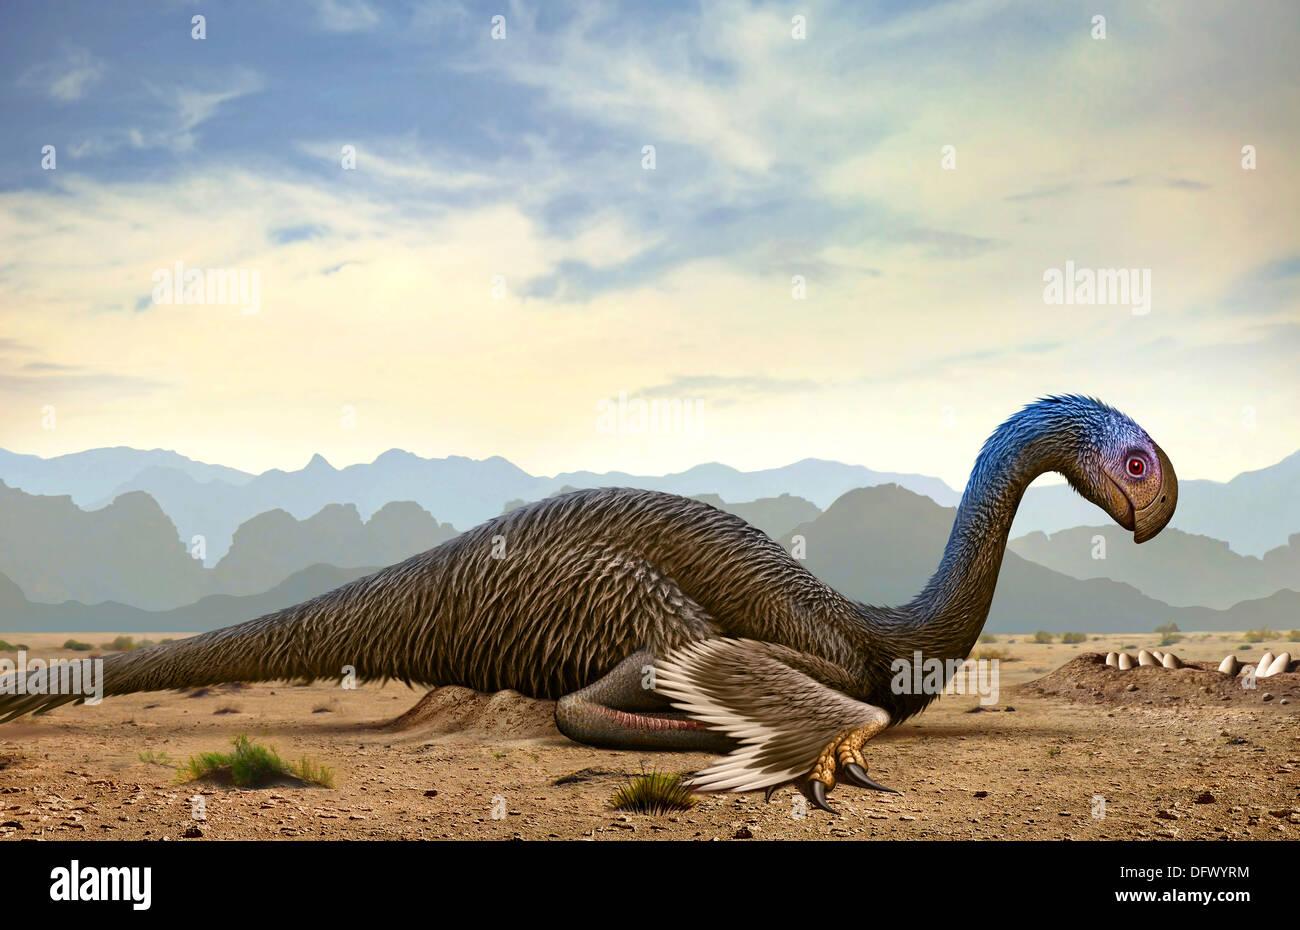 Gigantoraptor, a genus of giant oviraptorosaurian theropod dinosaur from the Cretaceous Period. Stock Photo